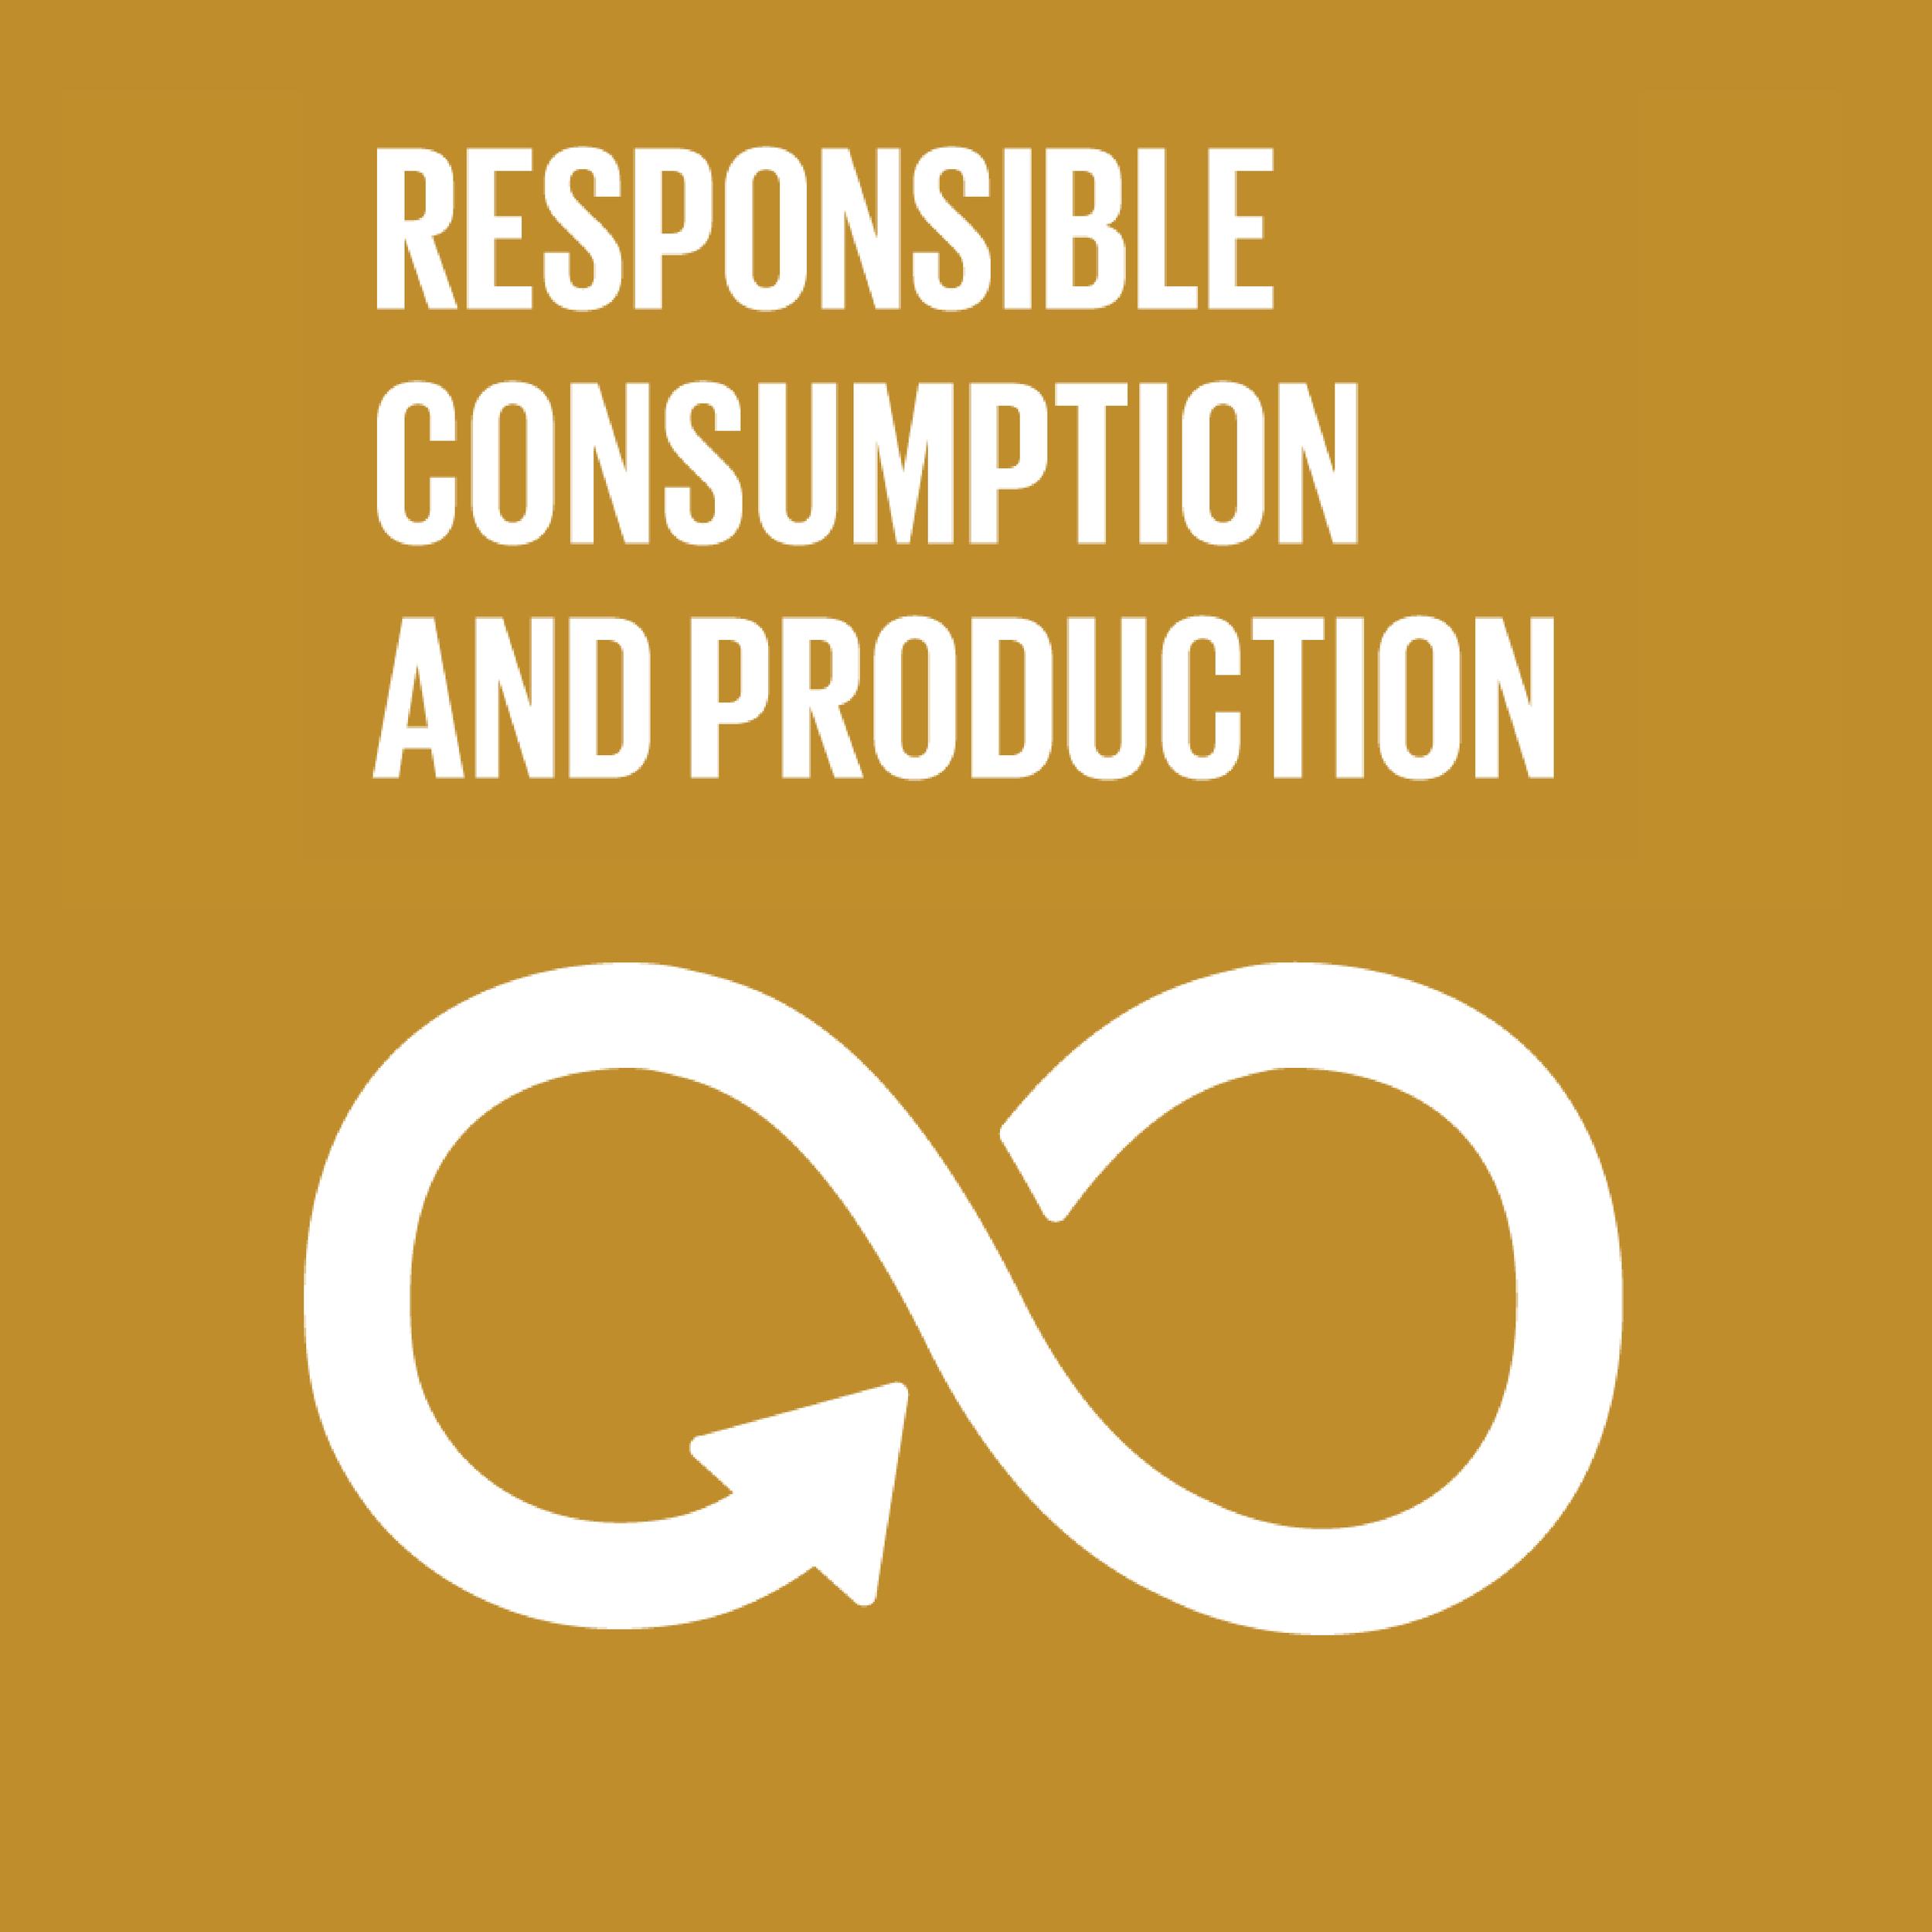 consumption-01.png